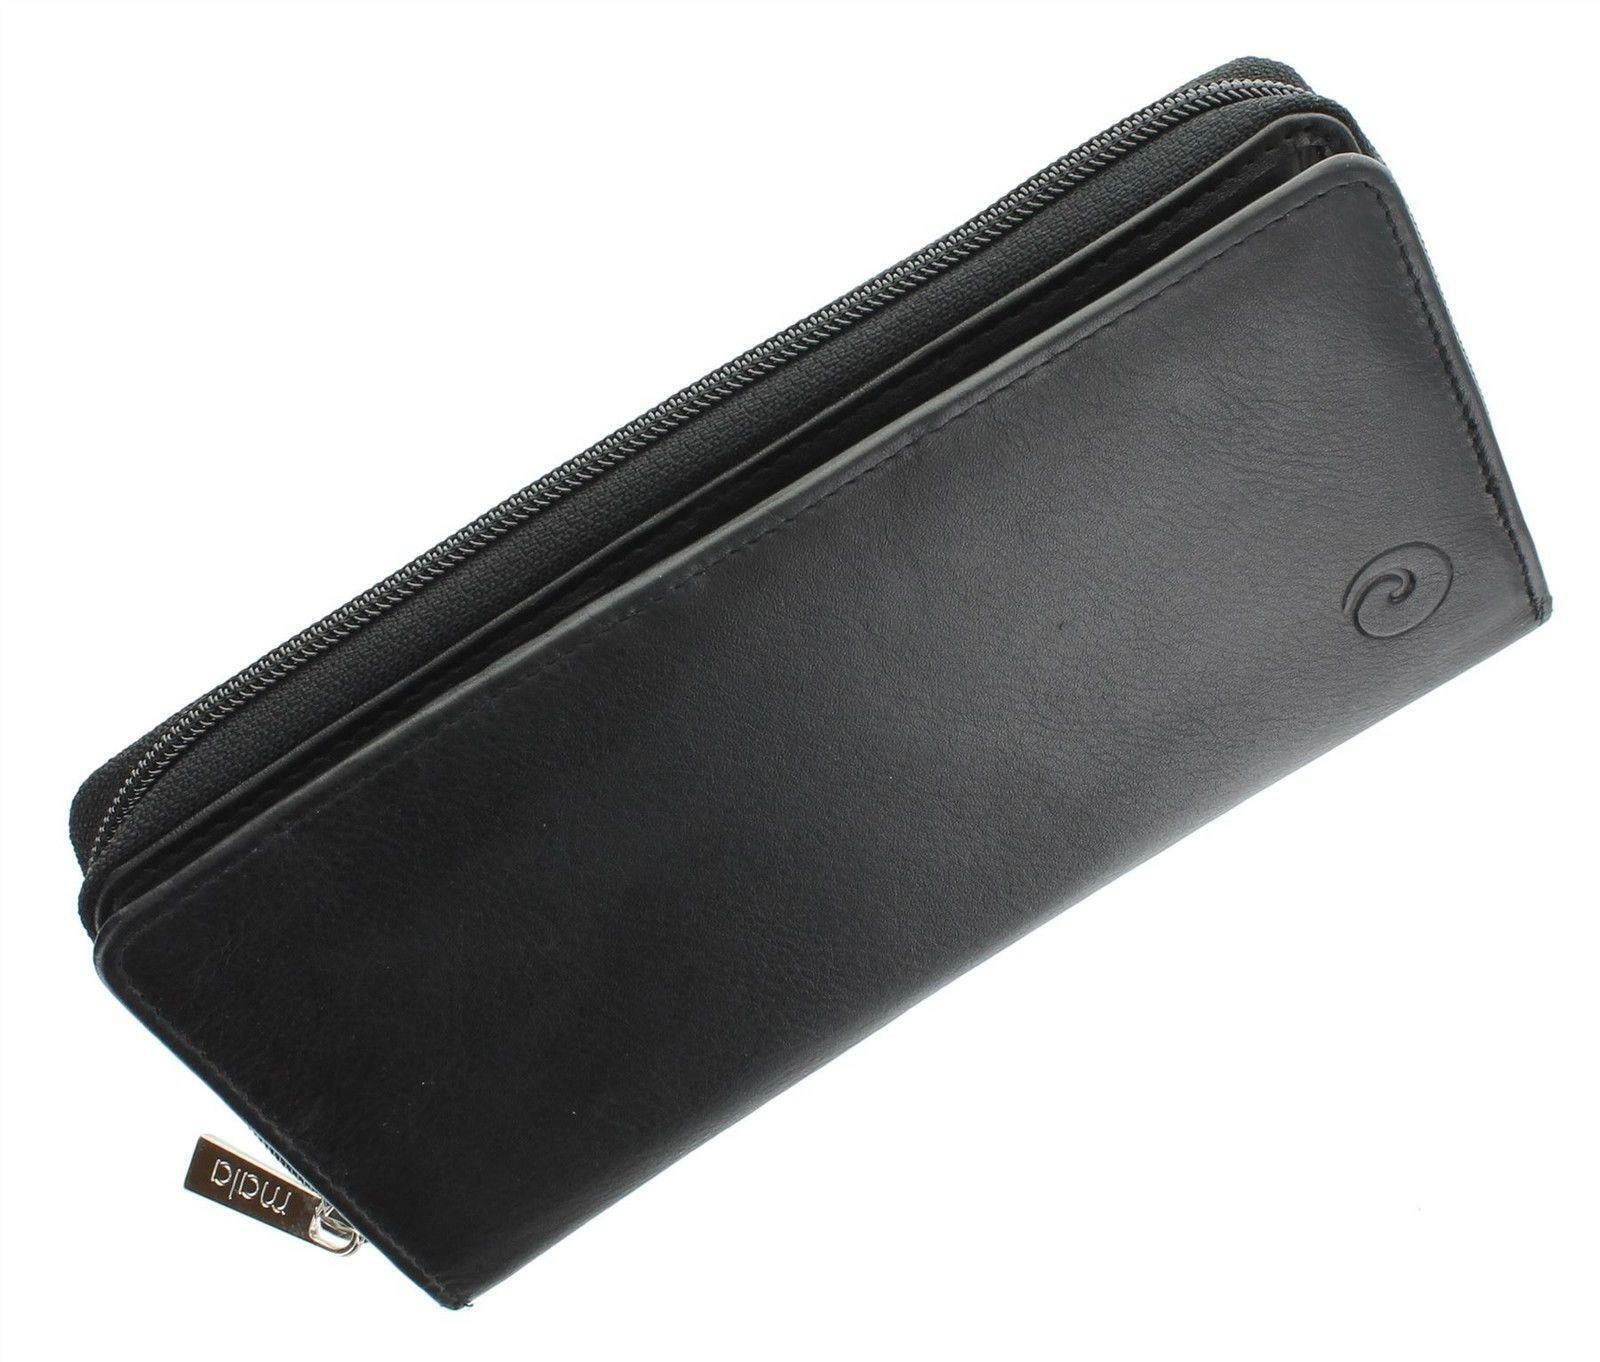 Origin Ladies Purse Wallet Mala Leather & RFID Indentification Protection 3258